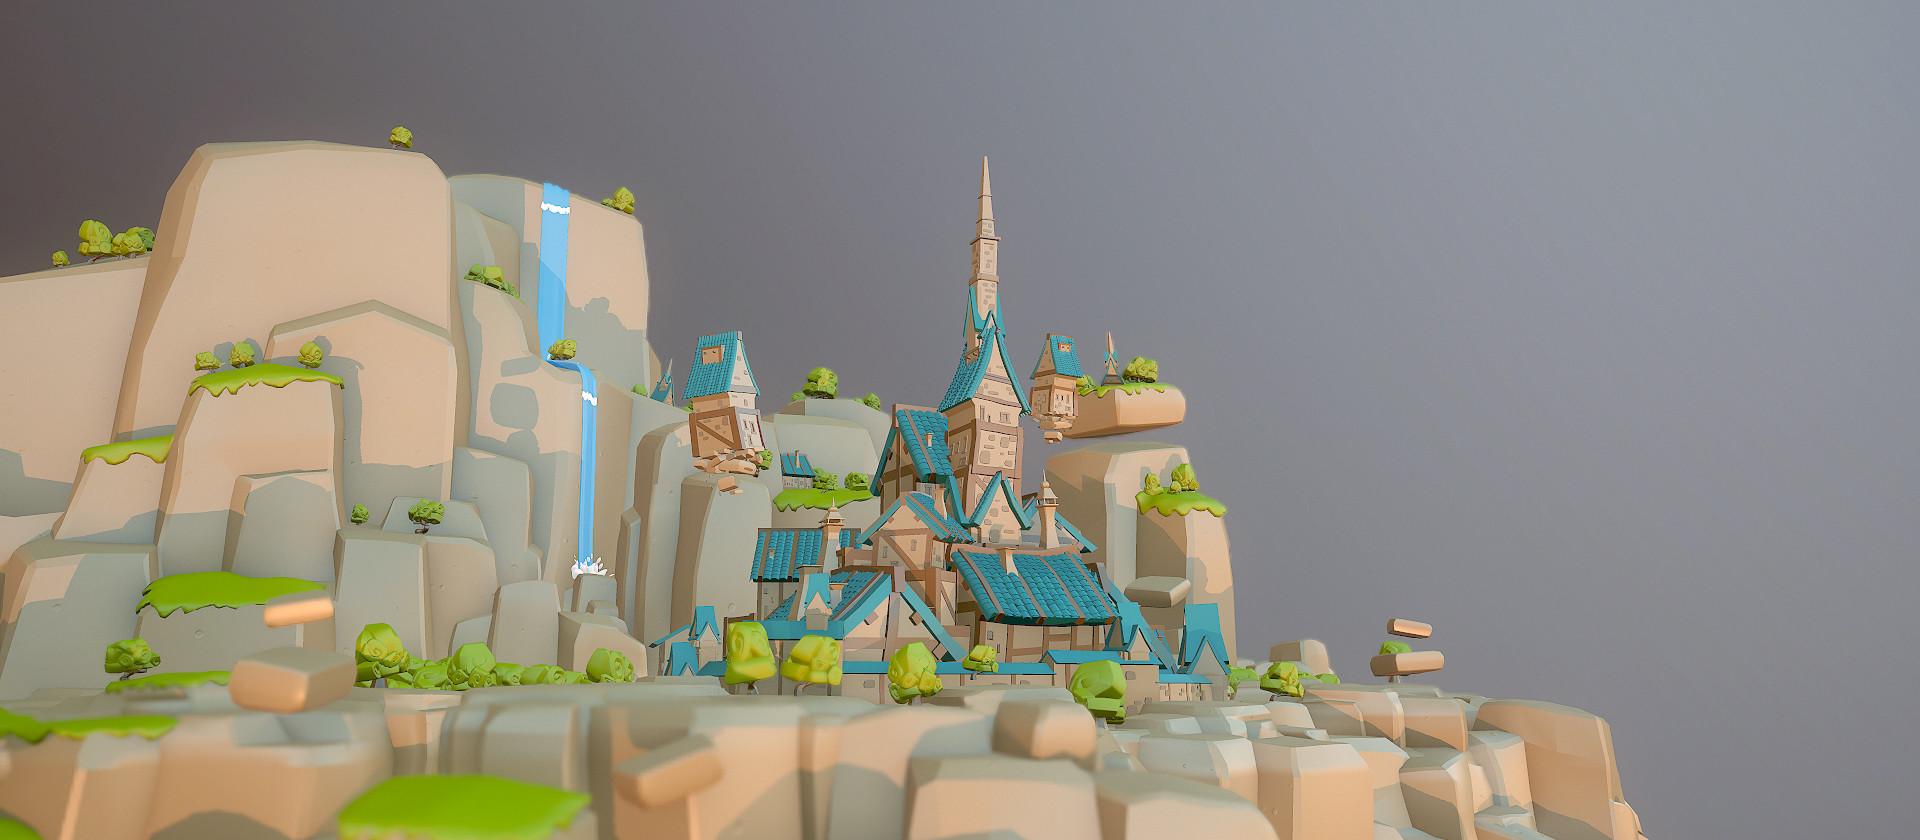 Basile arquis basile arquis low poly fantasy town 01